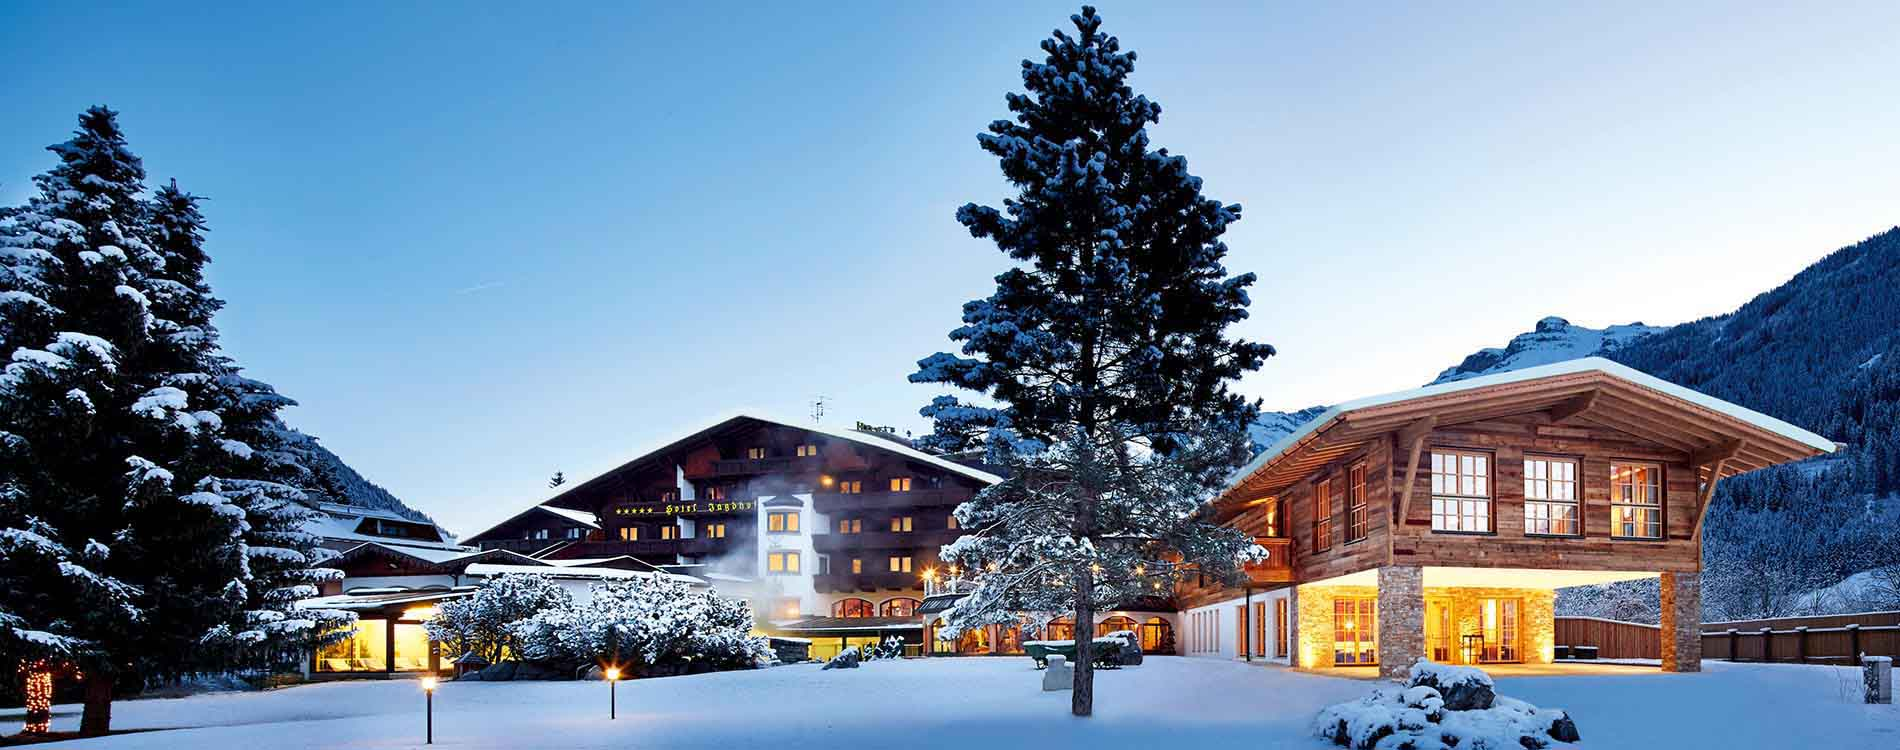 Special Spa @ the Jagdhof Neustift Tyrol Austria Niche Destinations